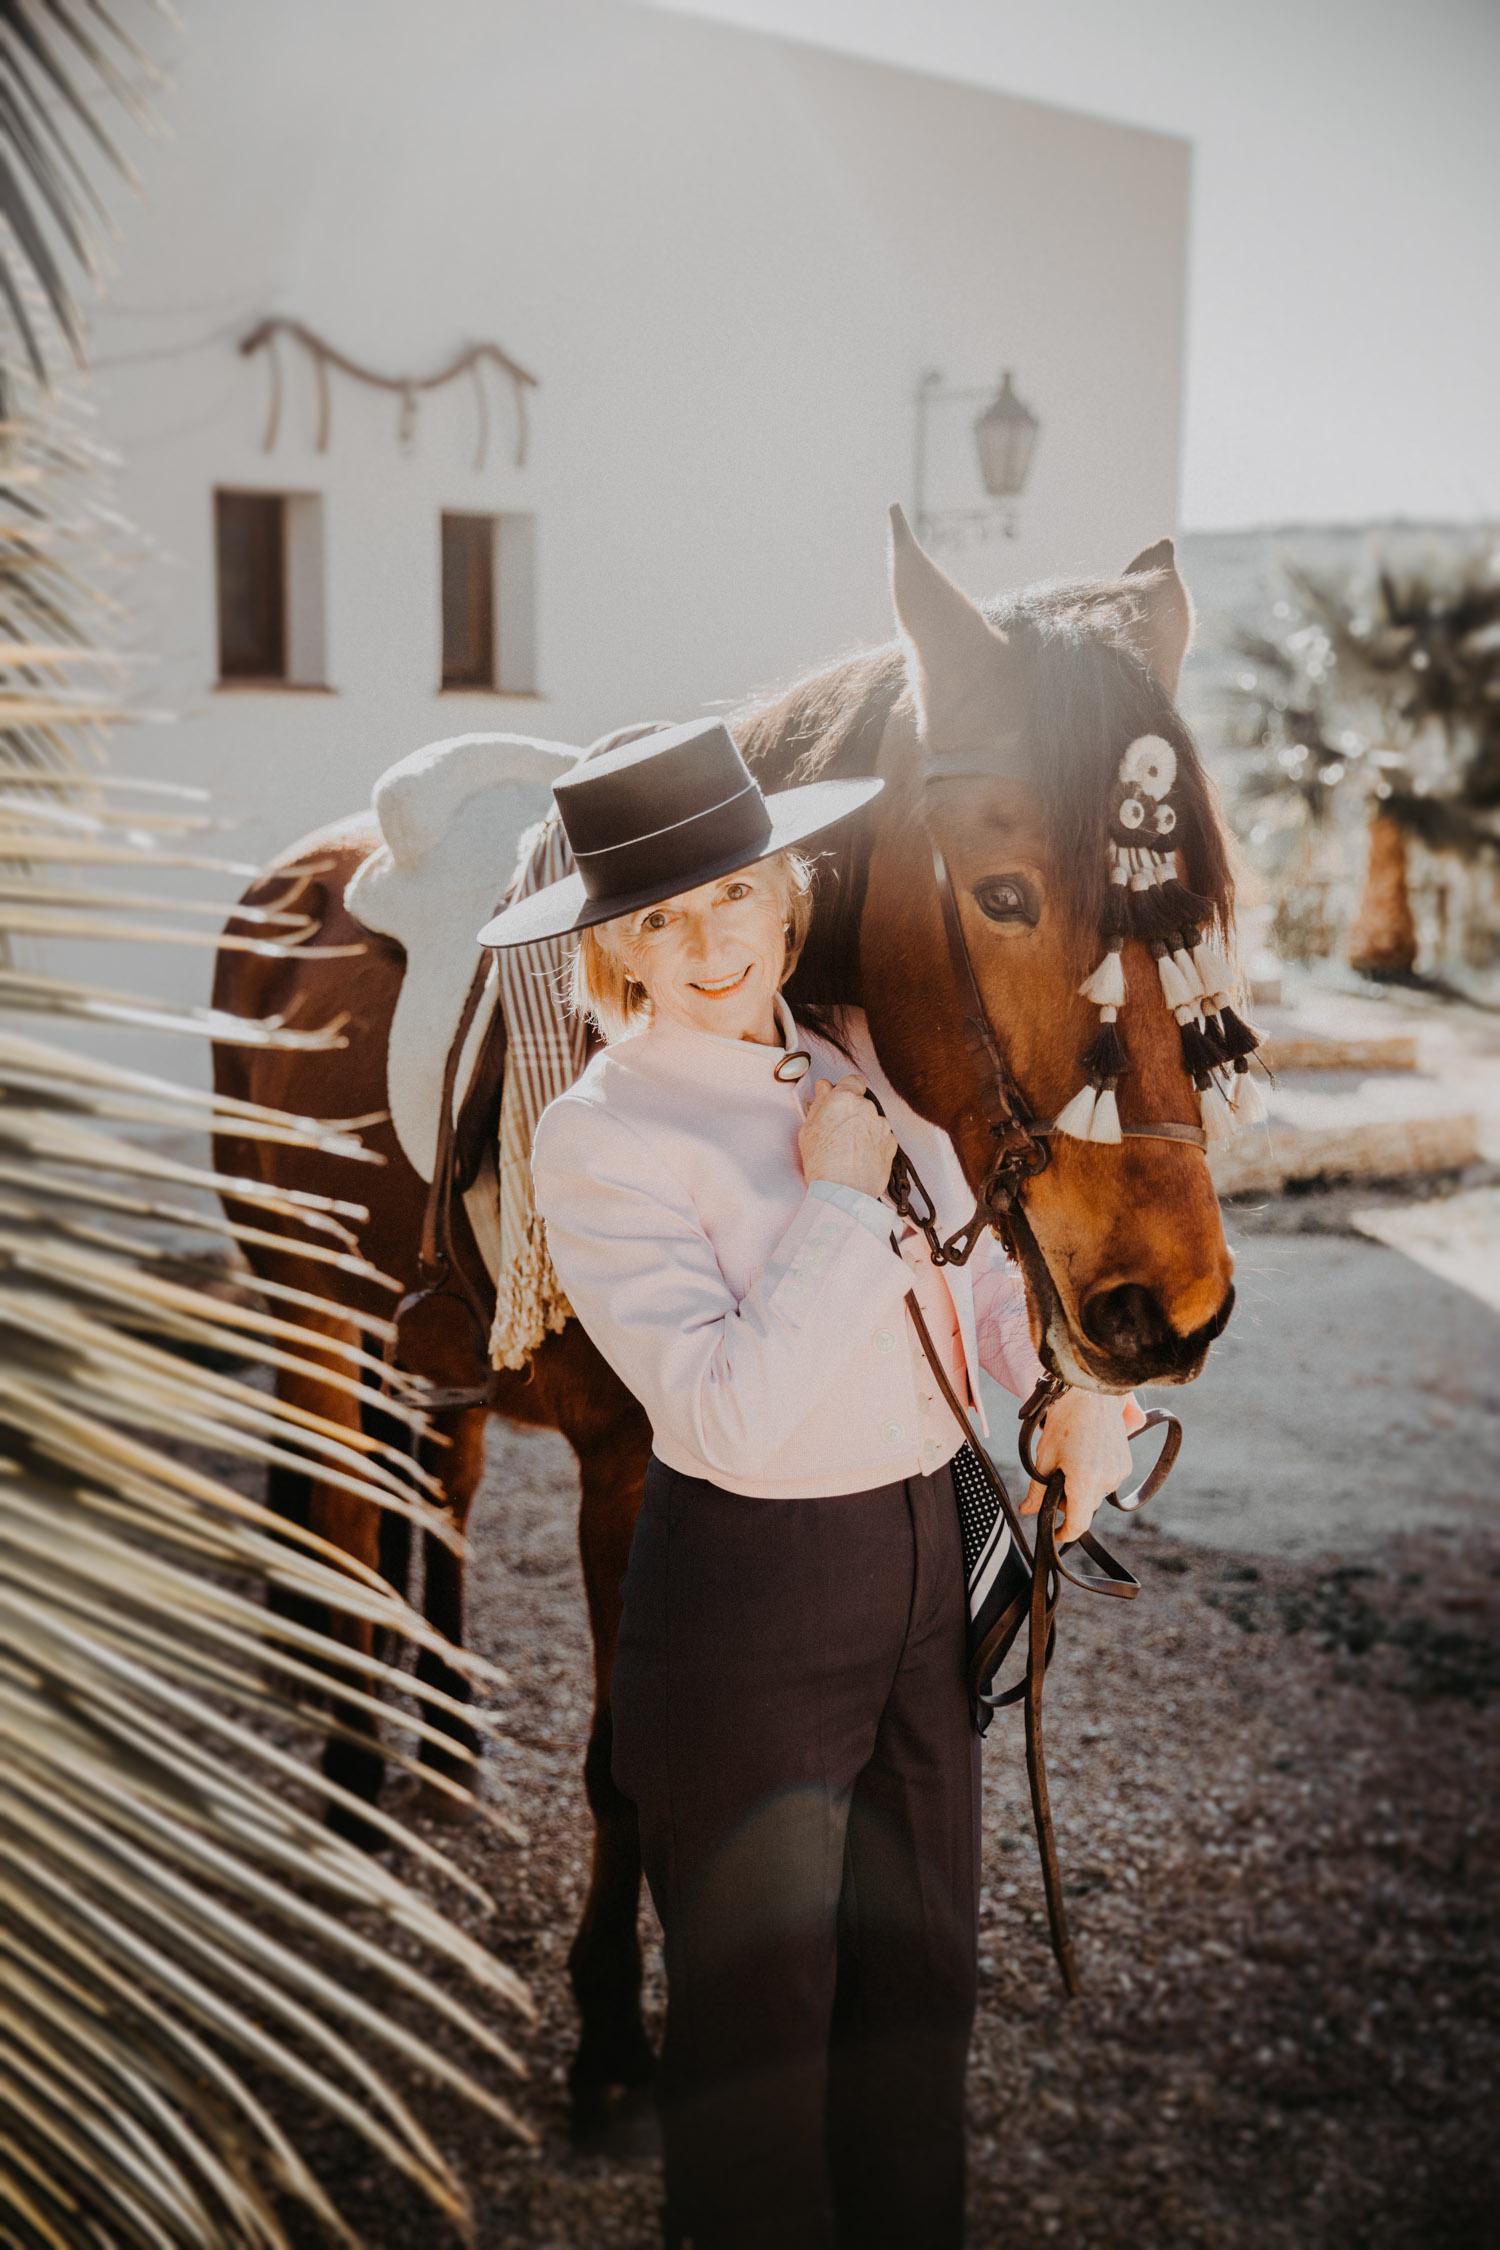 Pferdefotografin Pferdeshooting Pferdefotos Pferdefotografie Workshop Coaching Kurs Bildbearbeitung Photoshop Lightroom Schweiz Tabitha Roth Andalusien Fototour Spanien